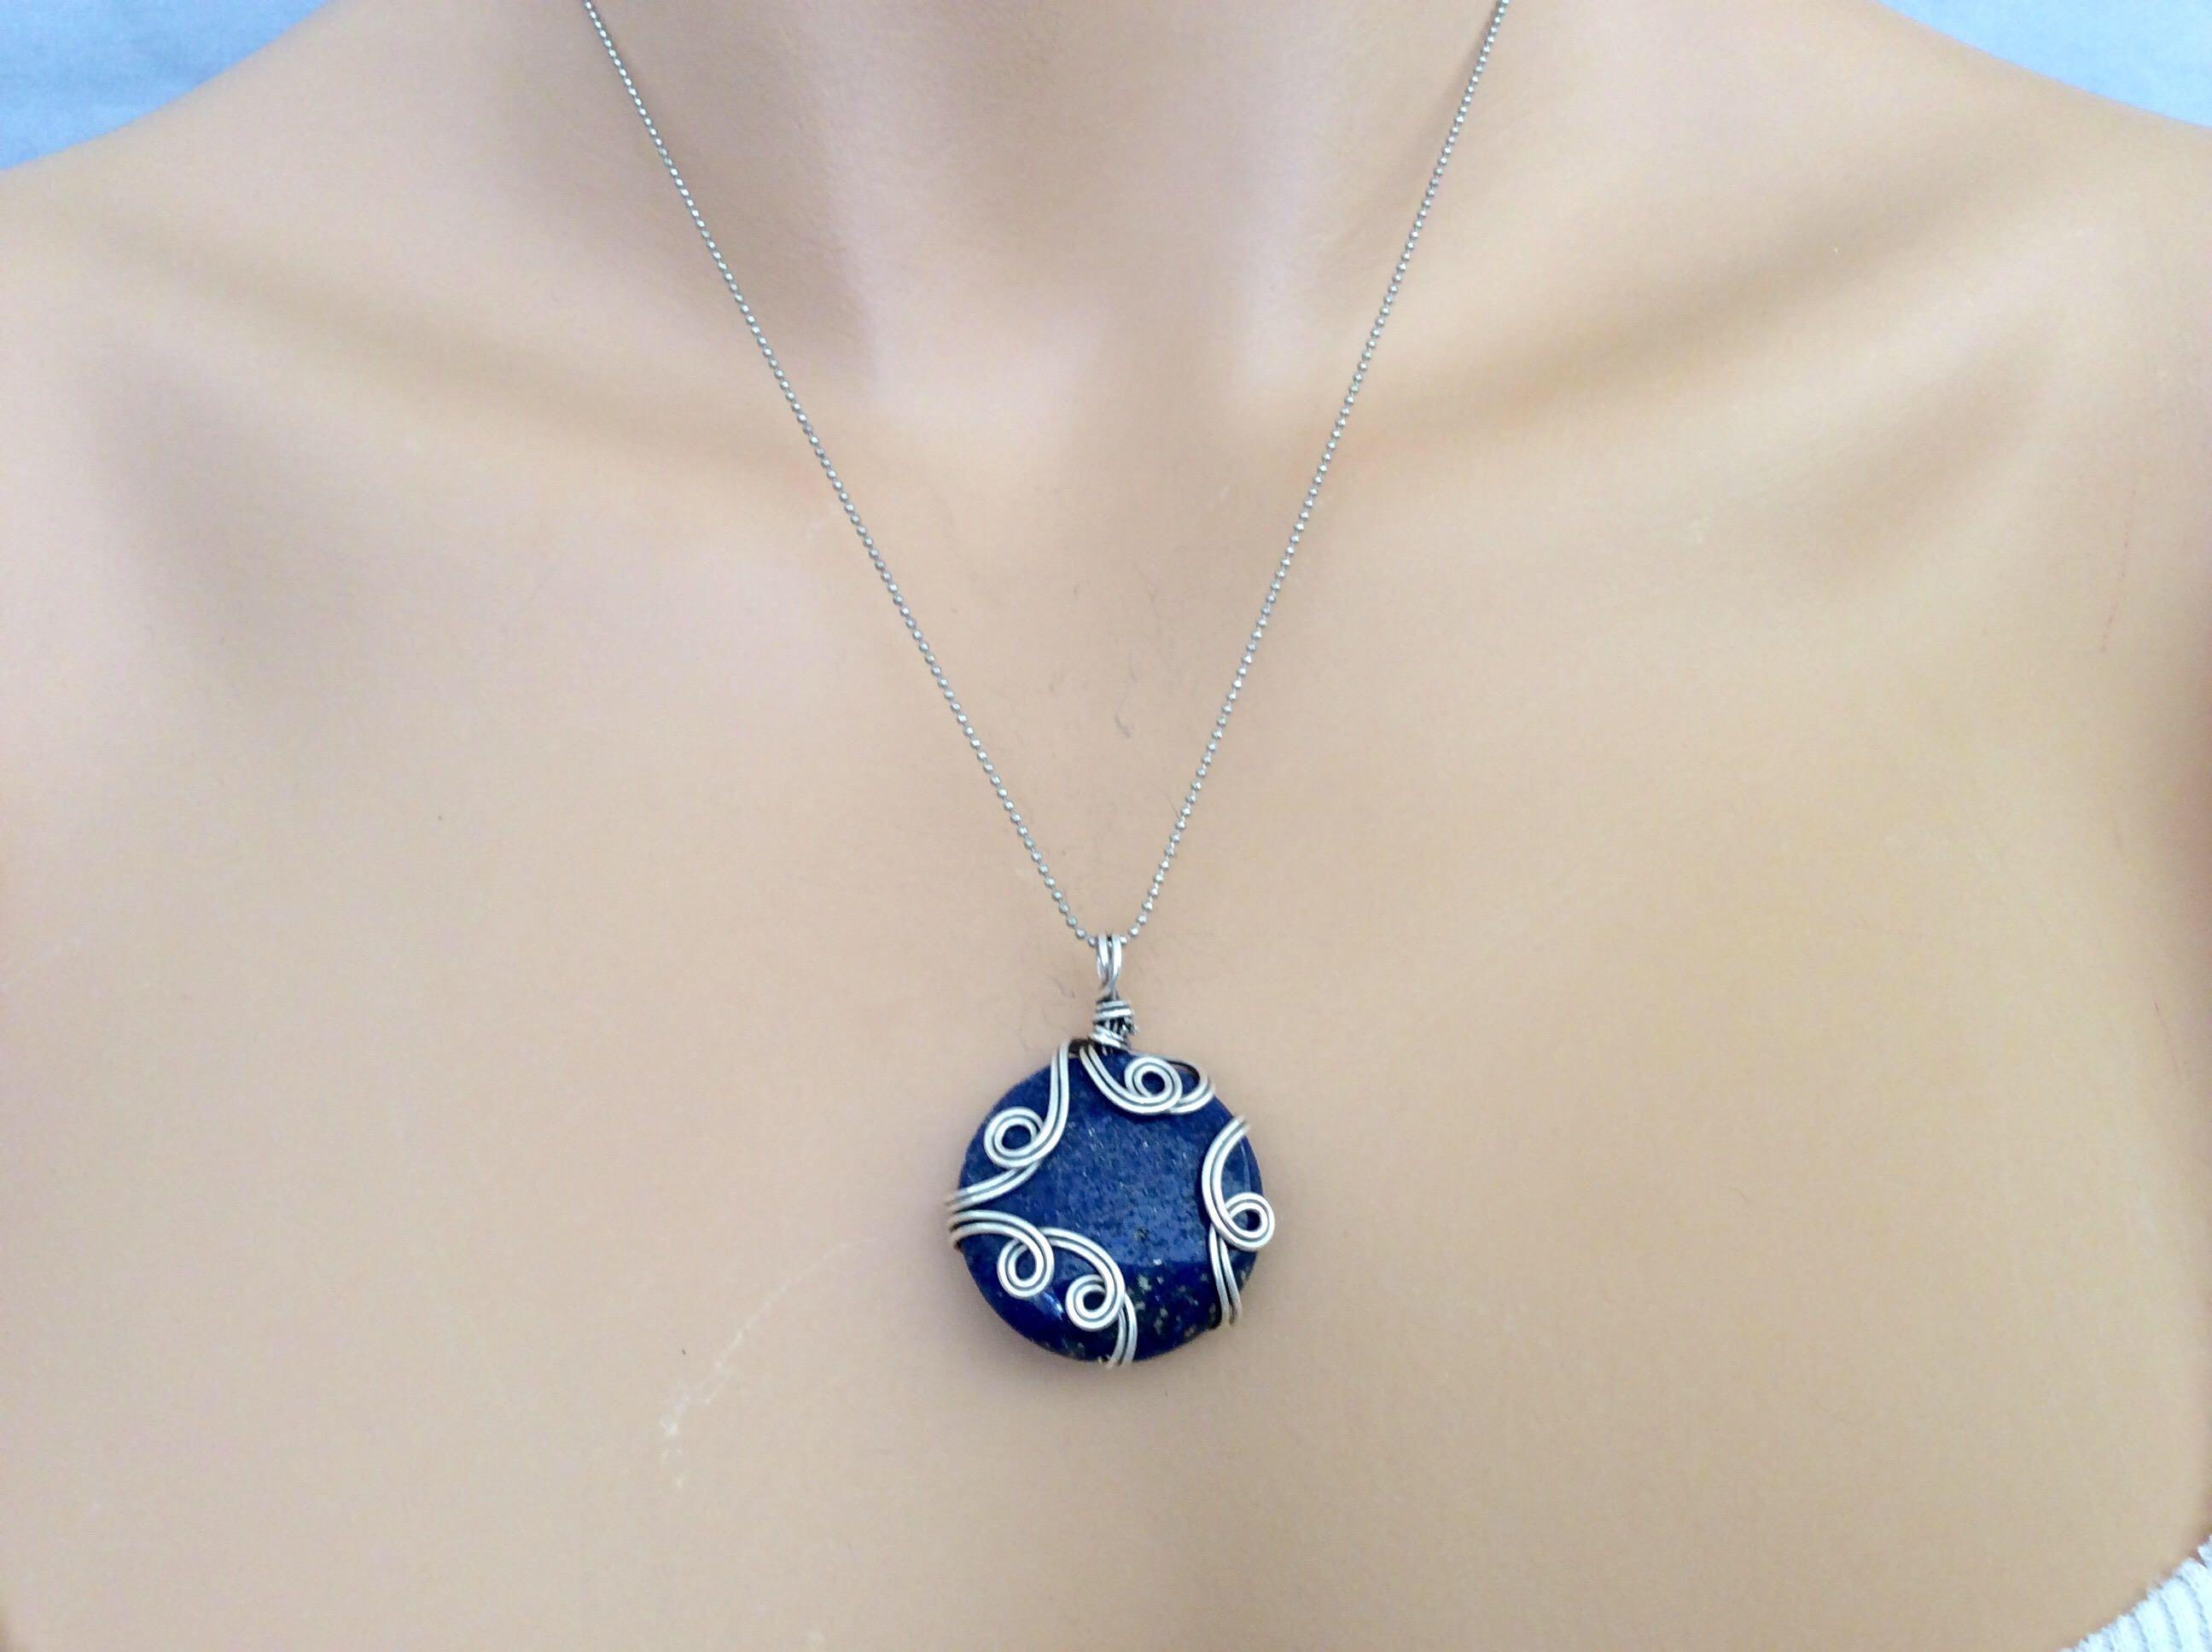 Pin by Debbie Hodge on JeWeLrY-WiRe WrApS | Pinterest | Lapis lazuli ...